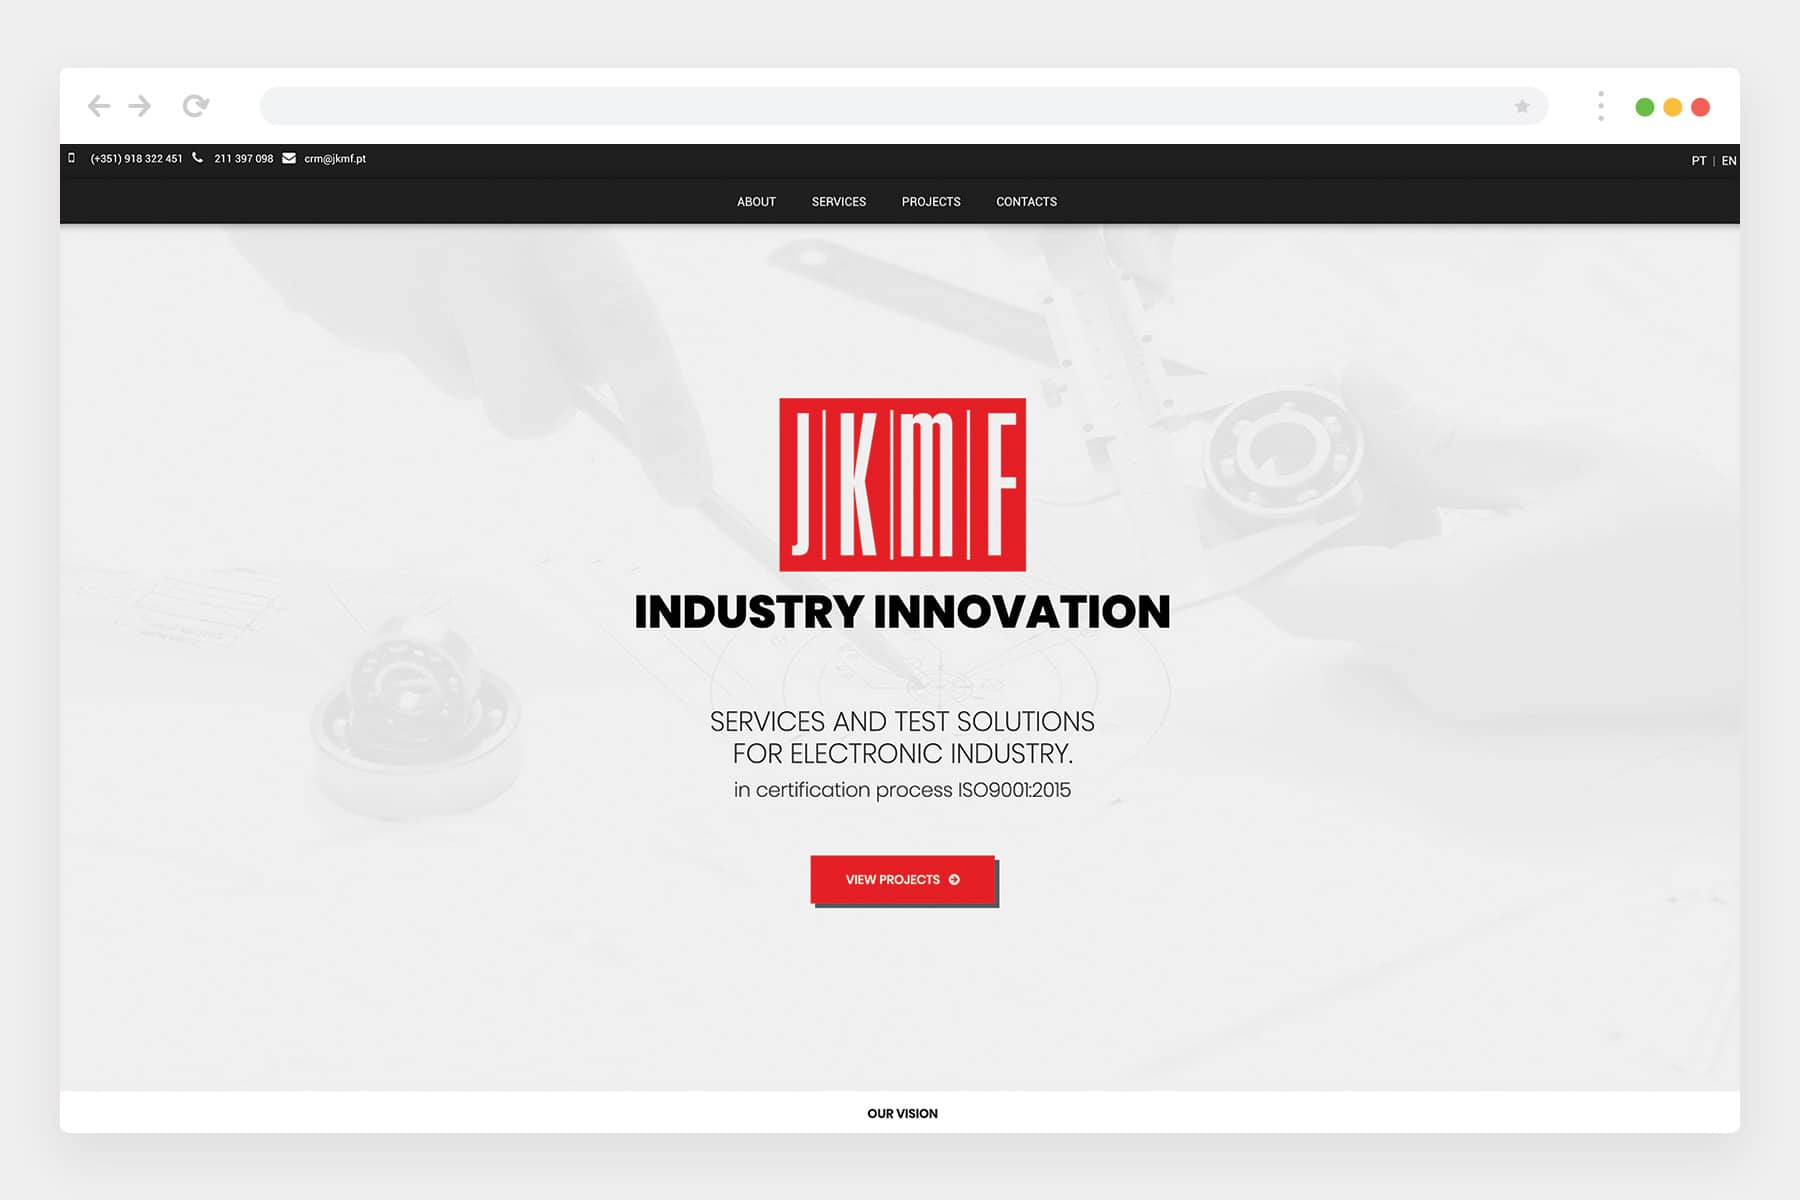 JKMF website